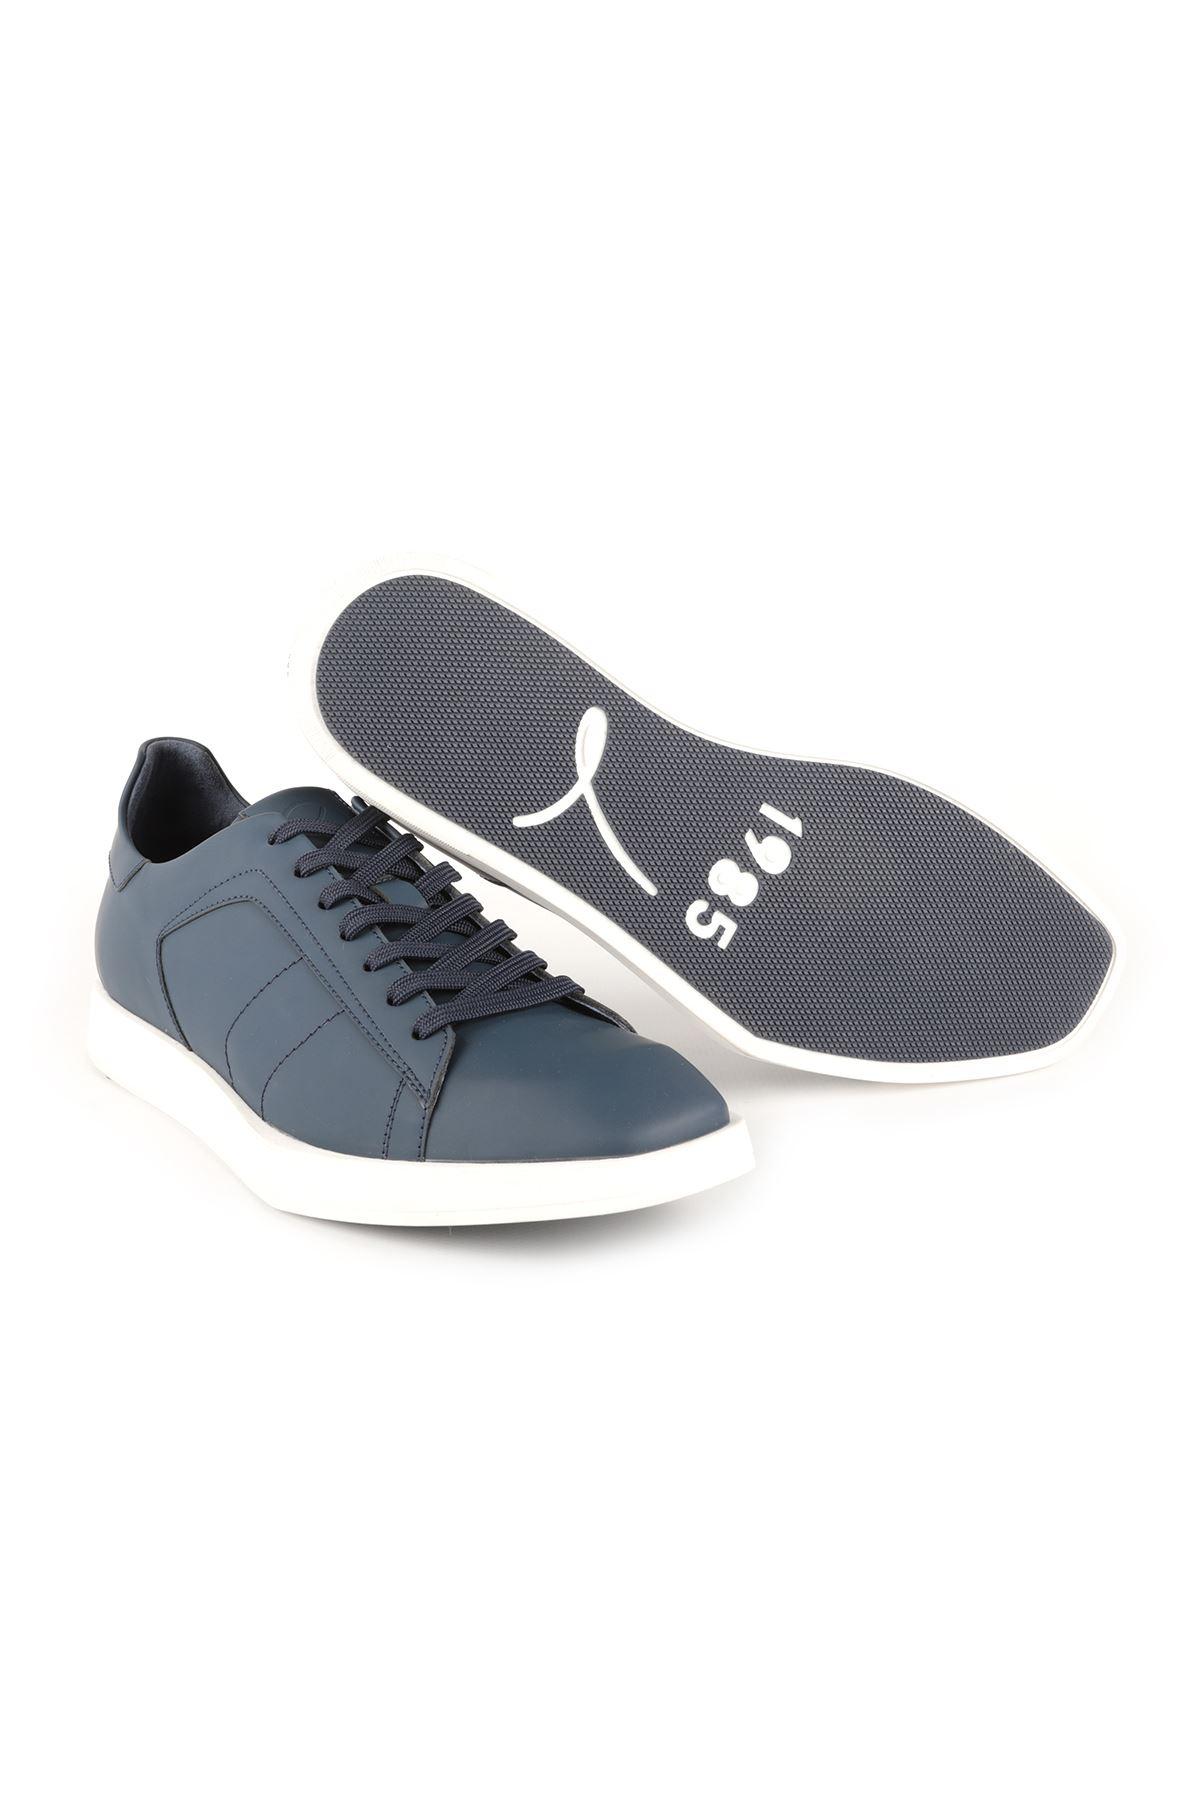 Libero L3805 Navy Blue Men Shoes